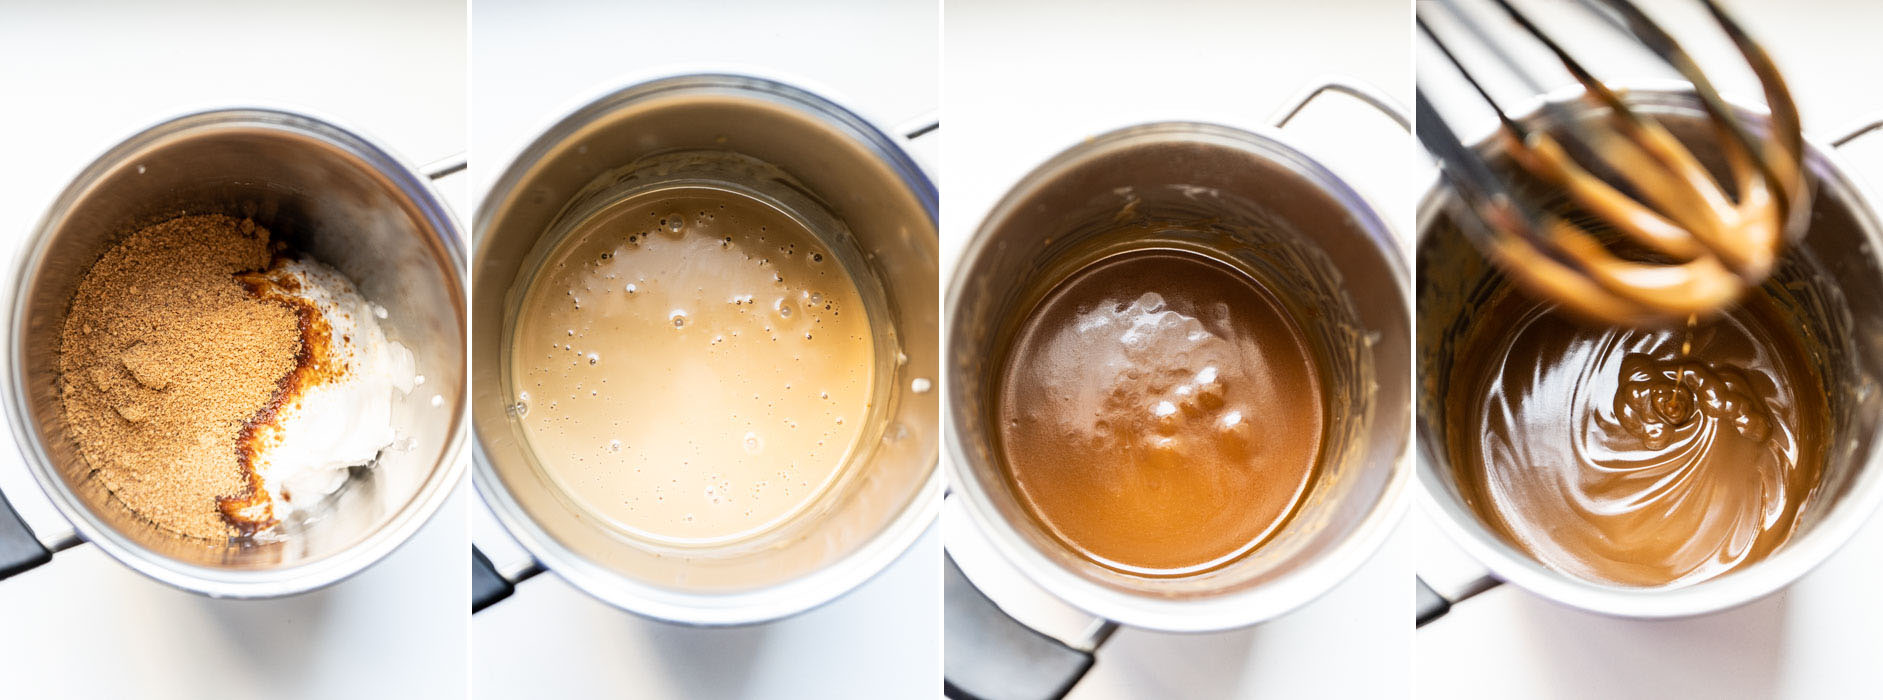 Chestnut & chocolate ganache tart w/ salted caramel {vegan} - Marta's Plants